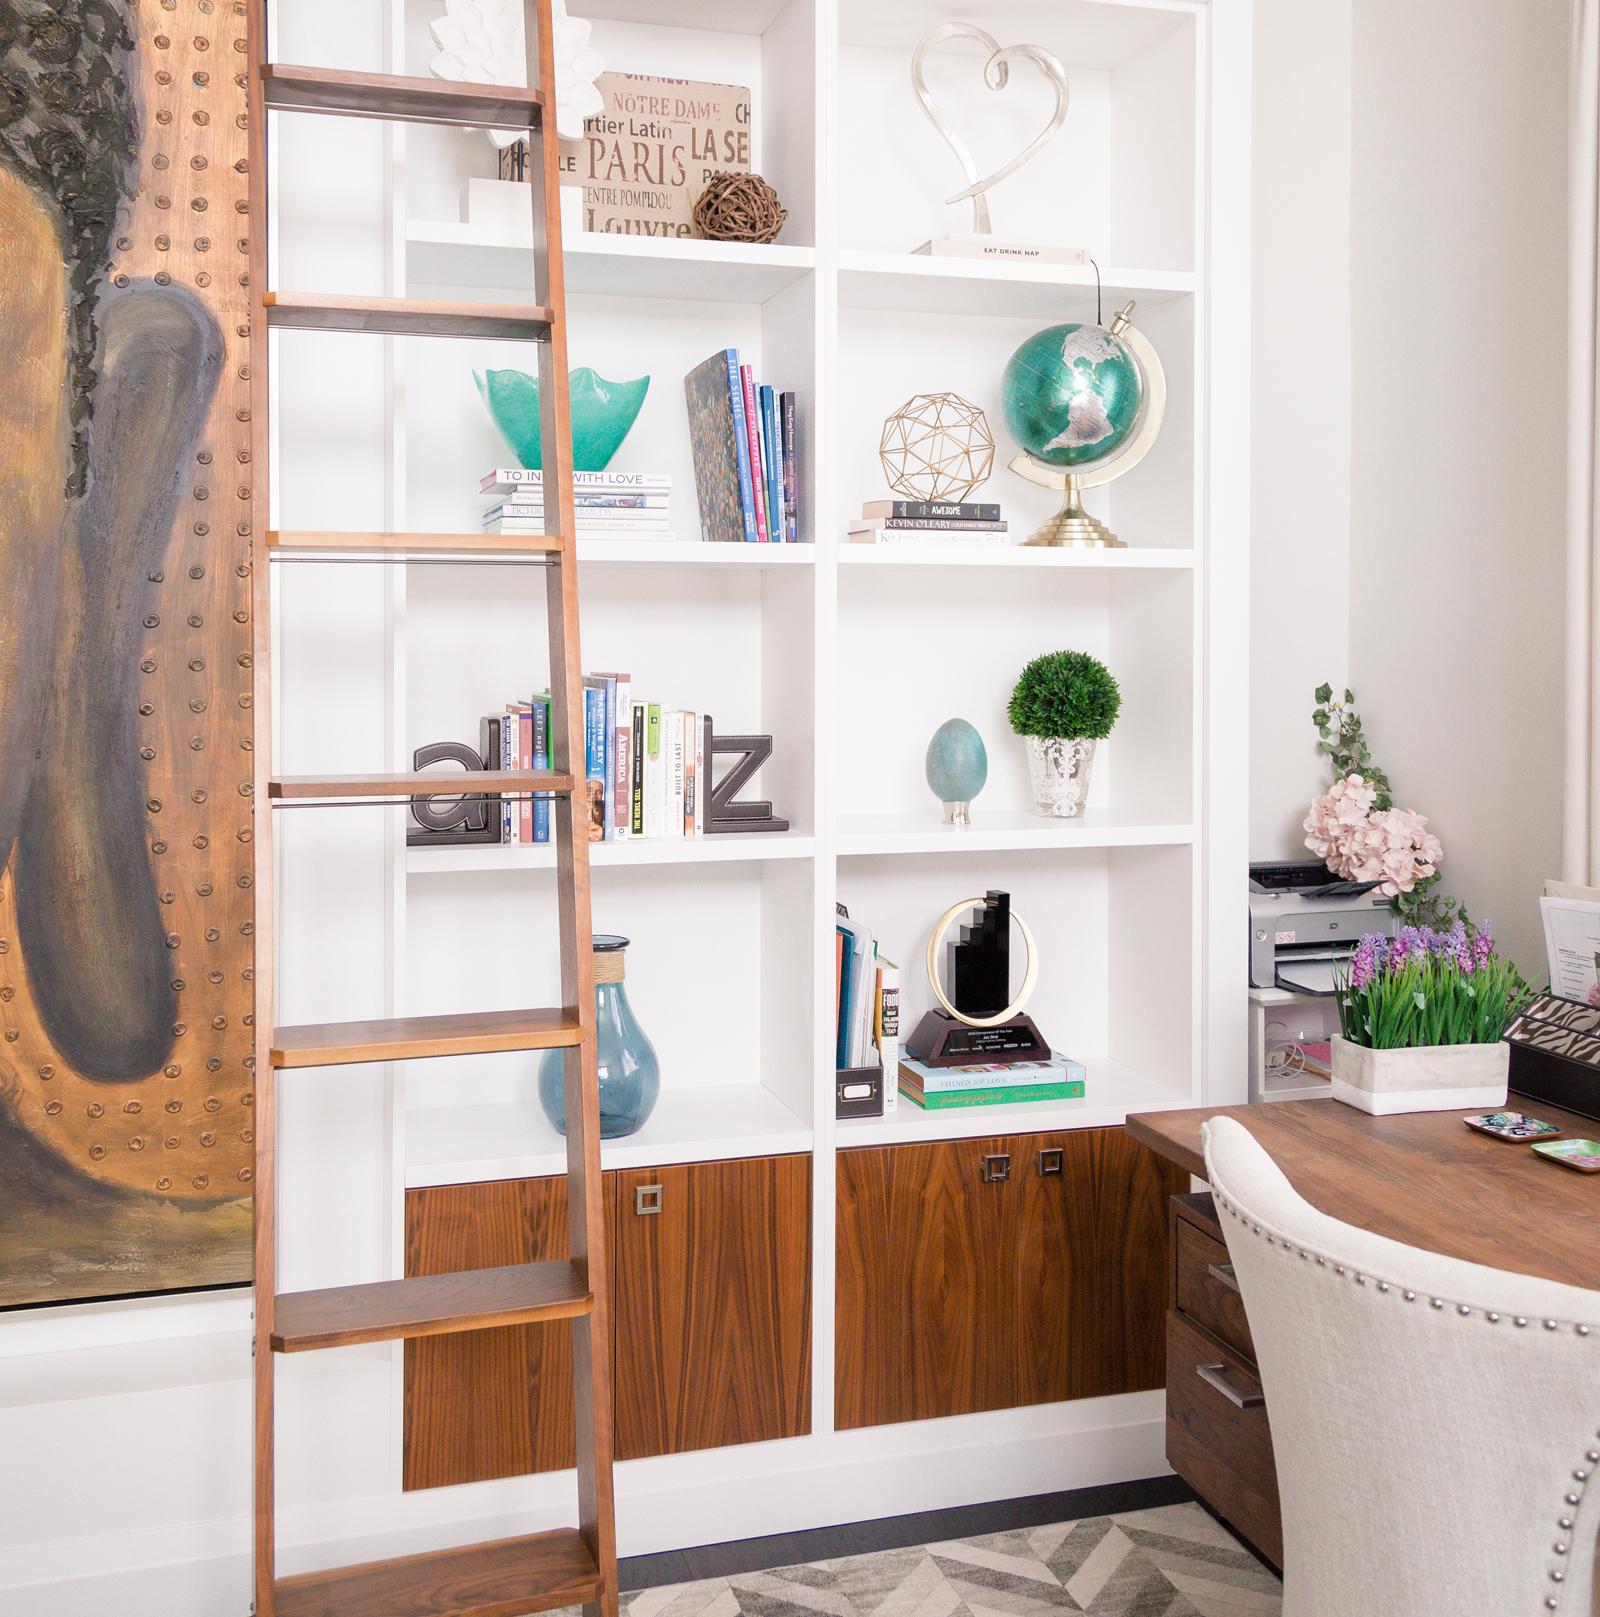 Concept Drawing Kitchen Cabinet: Kitchen Cabinets Burlington